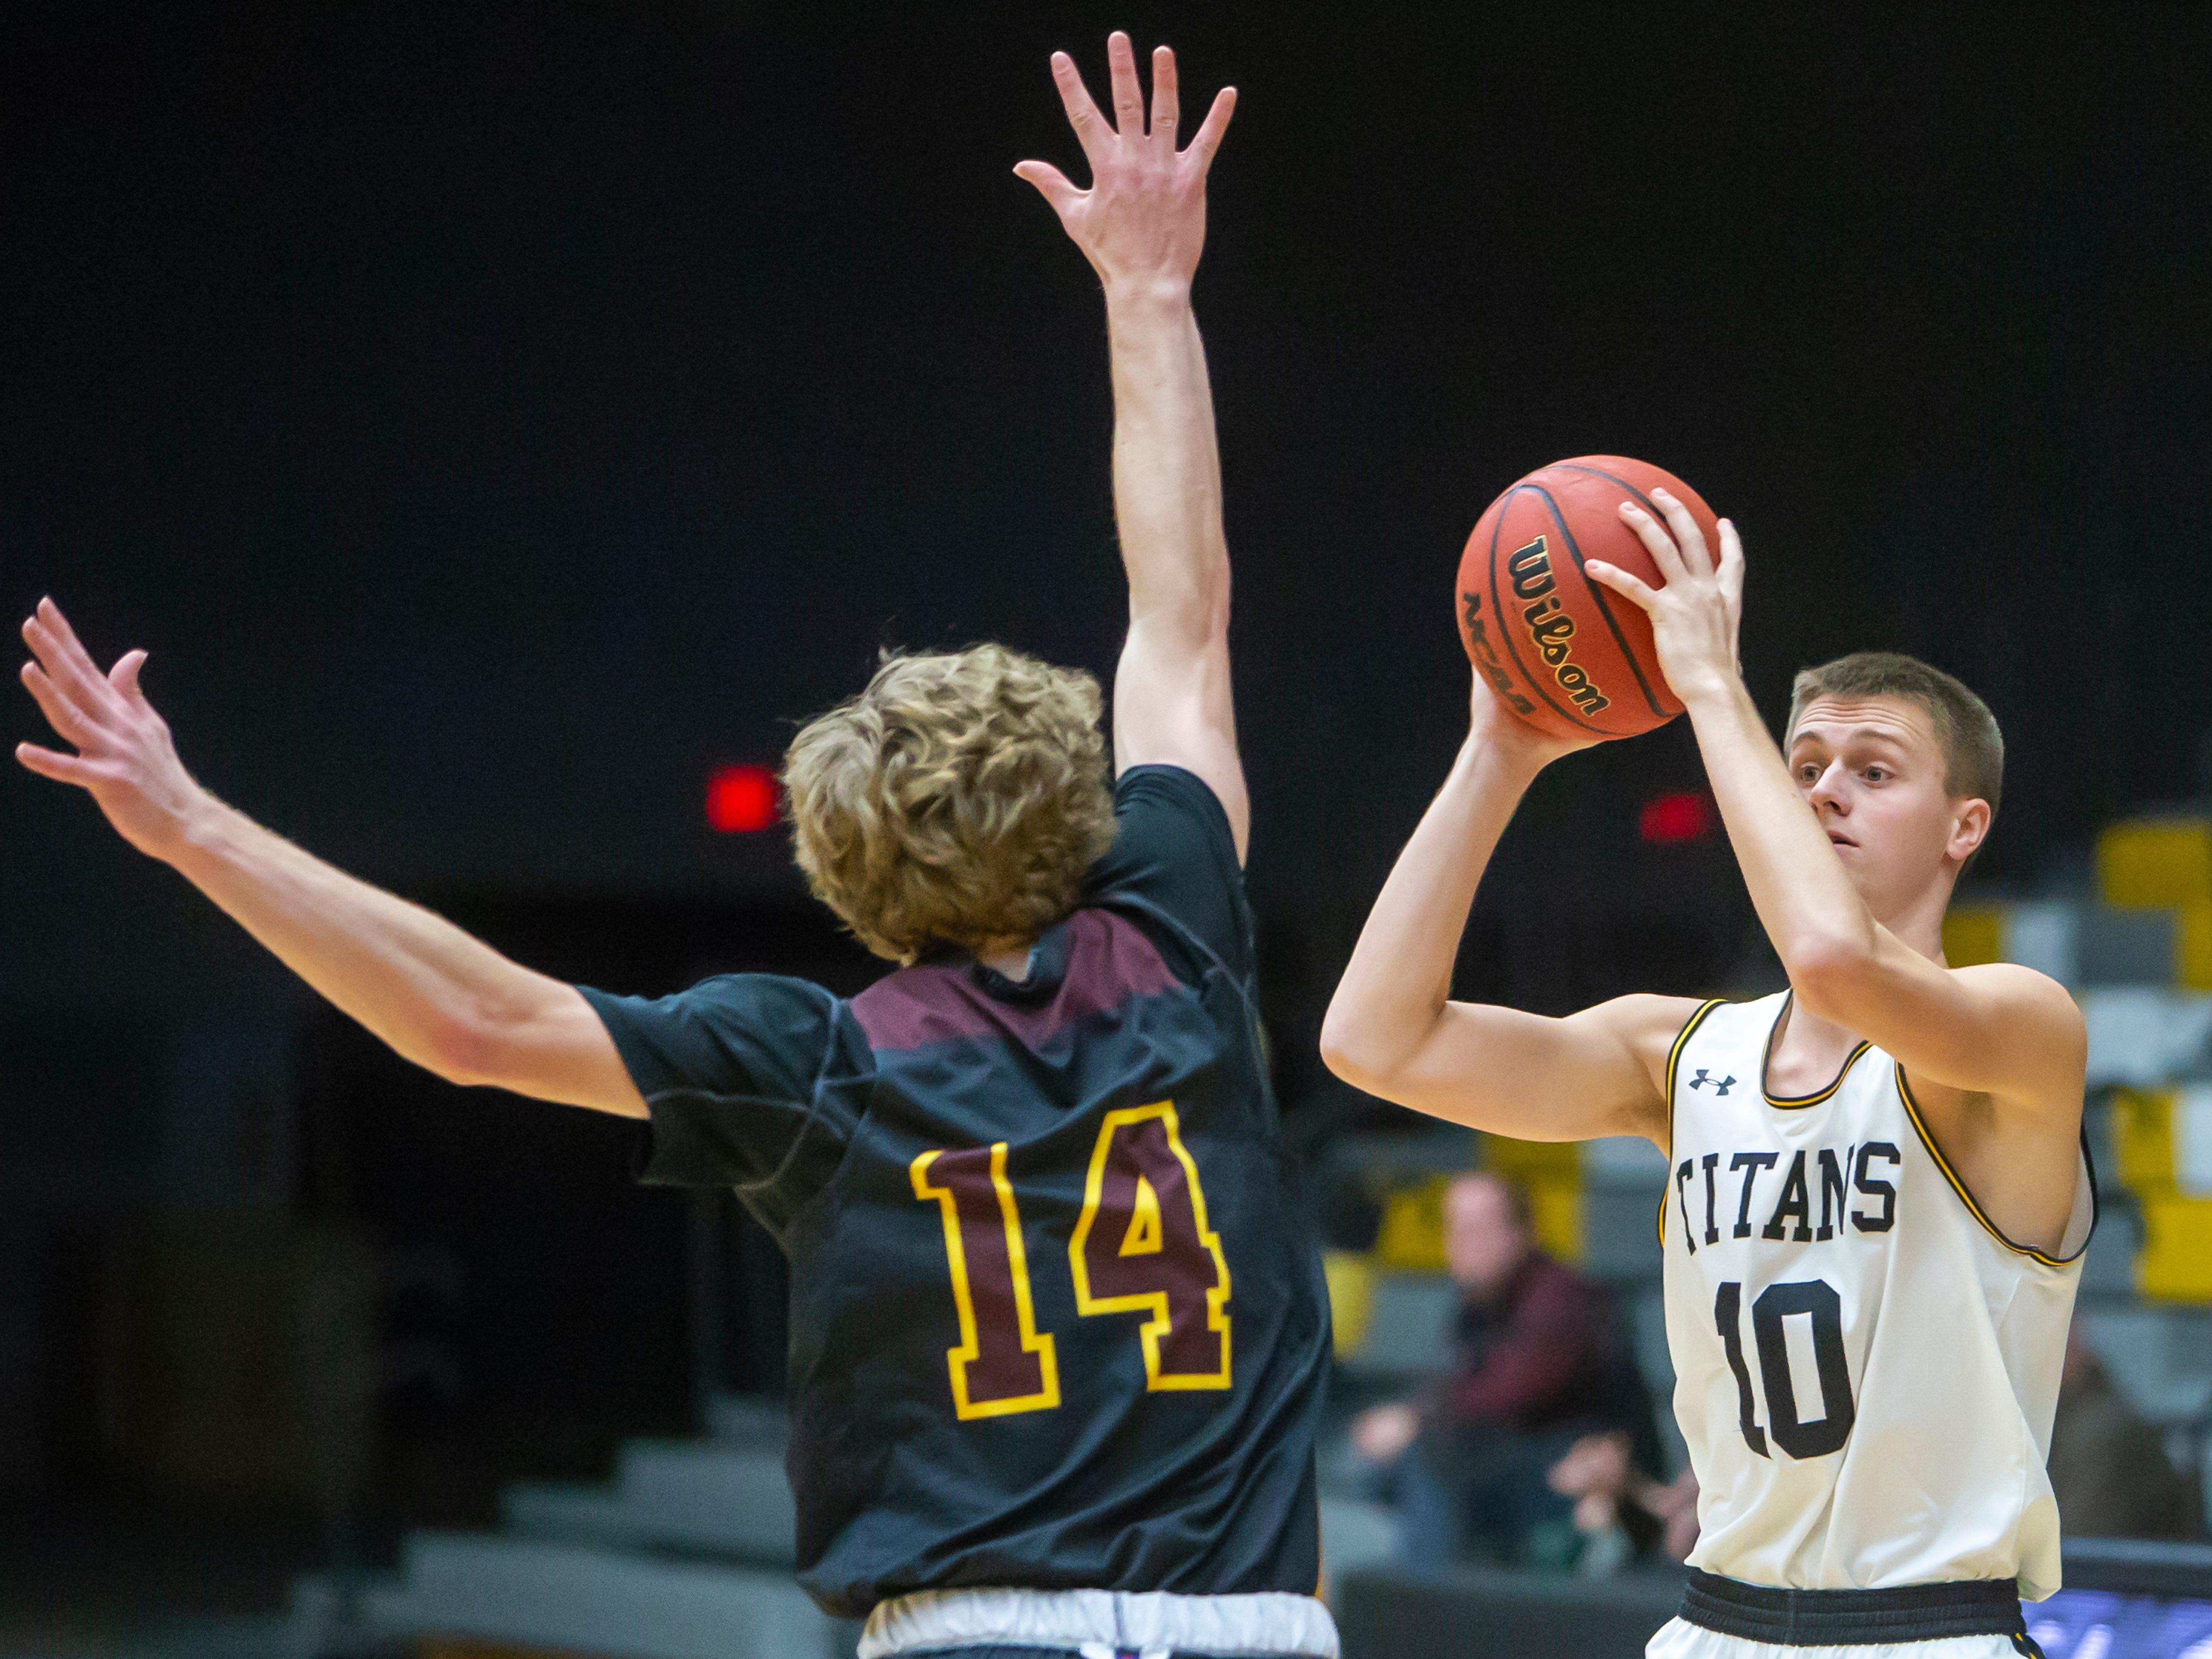 UW-Oshkosh's Jake Zeitler looks to pass the ball around Calvin's Thad Shymanski at the Kolf Sports Center on Saturday, December 8, 2018.